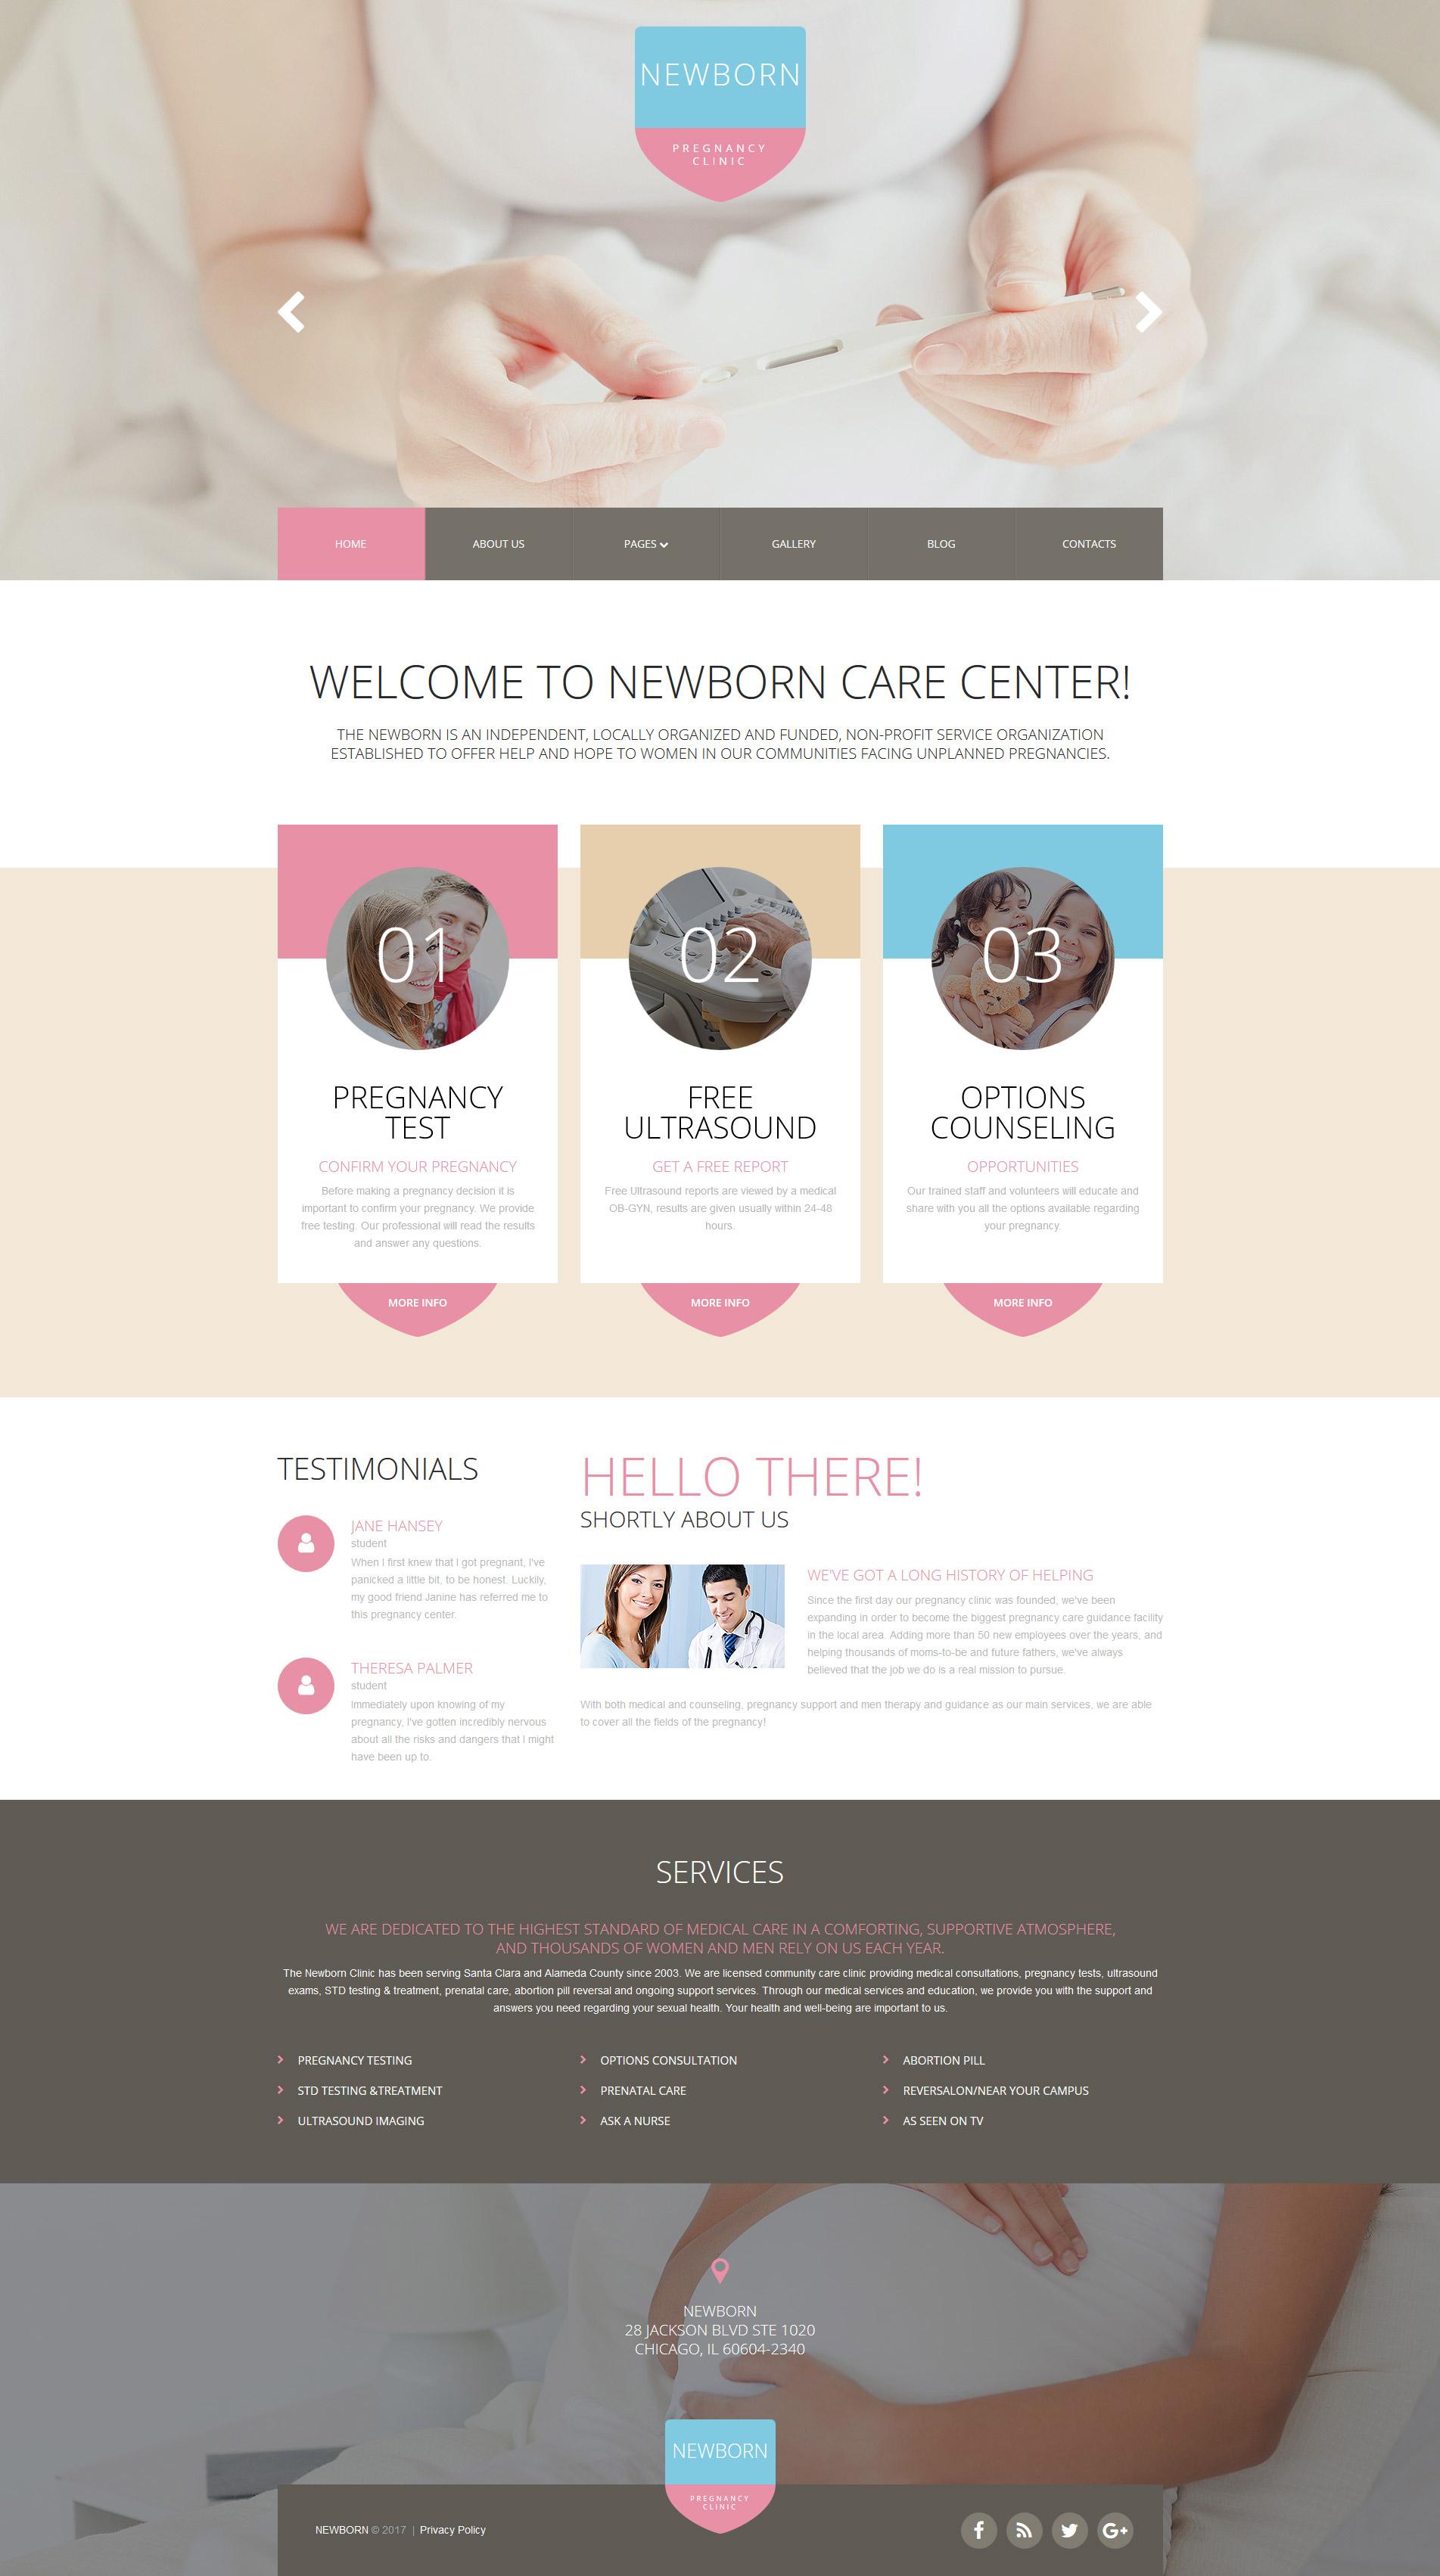 Responsywny szablon Joomla Newborn Responsive #62347 - zrzut ekranu